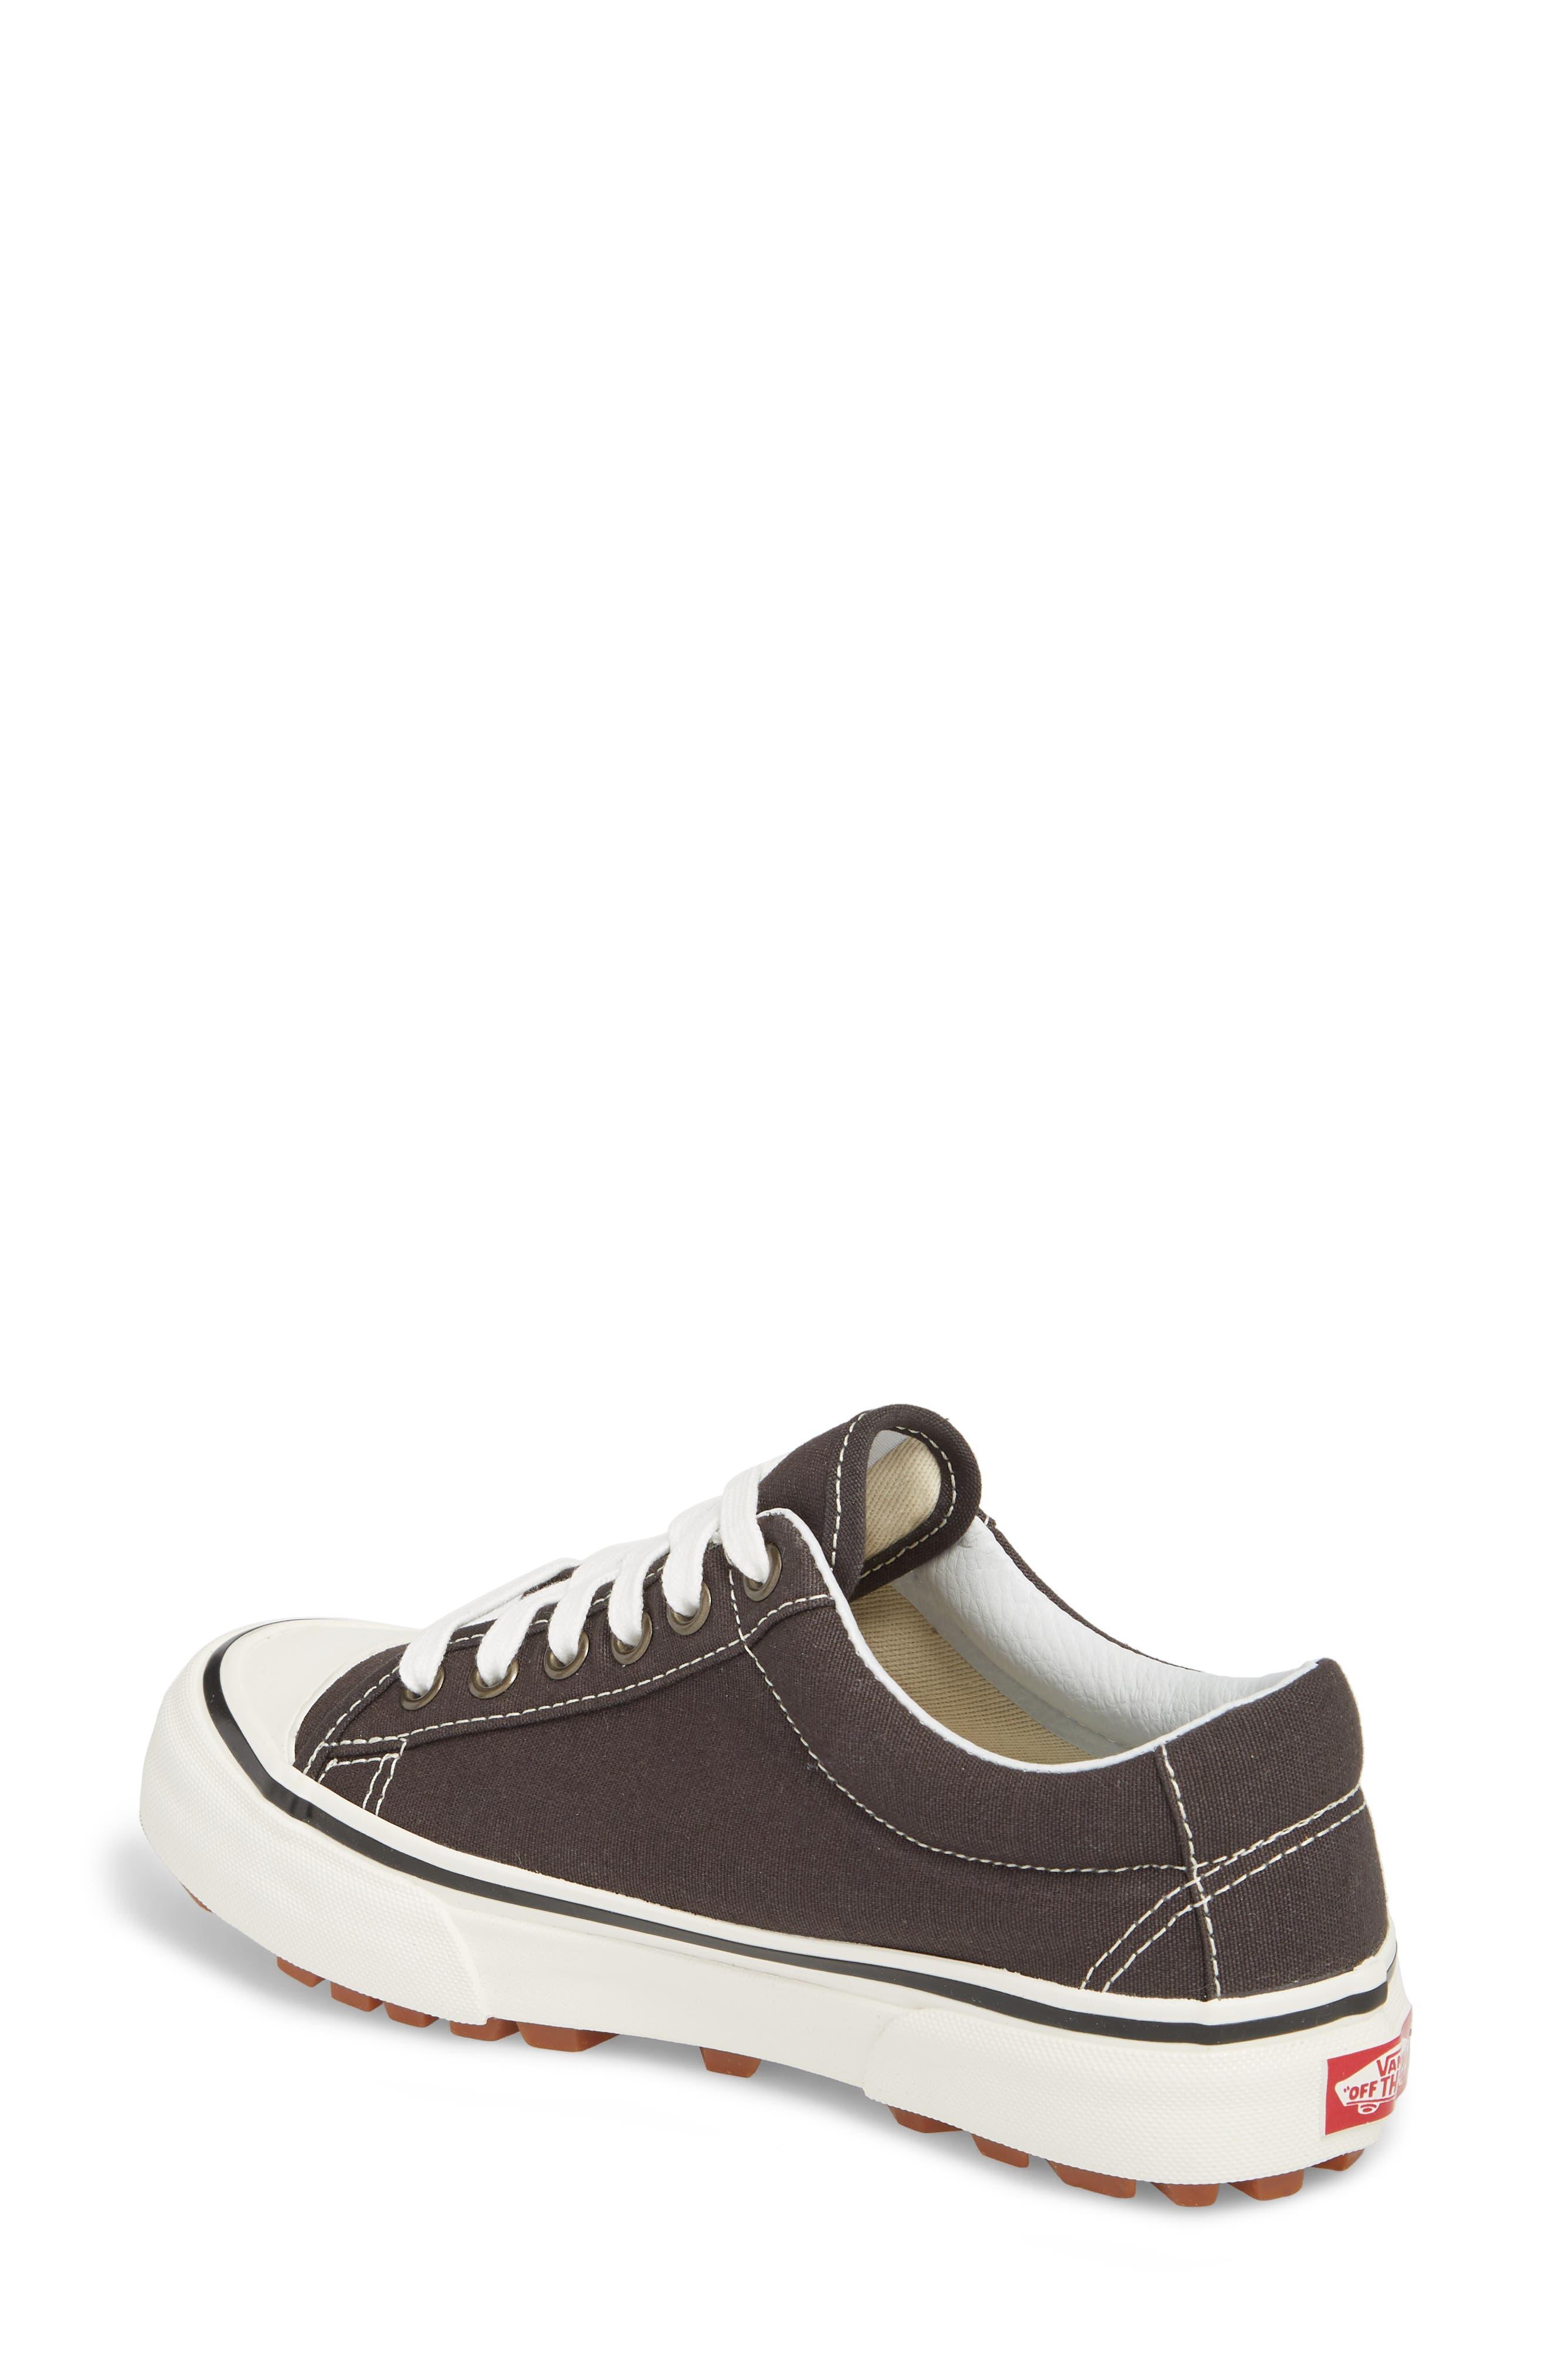 Anaheim Factory Style 29 DX Sneaker,                             Alternate thumbnail 2, color,                             001